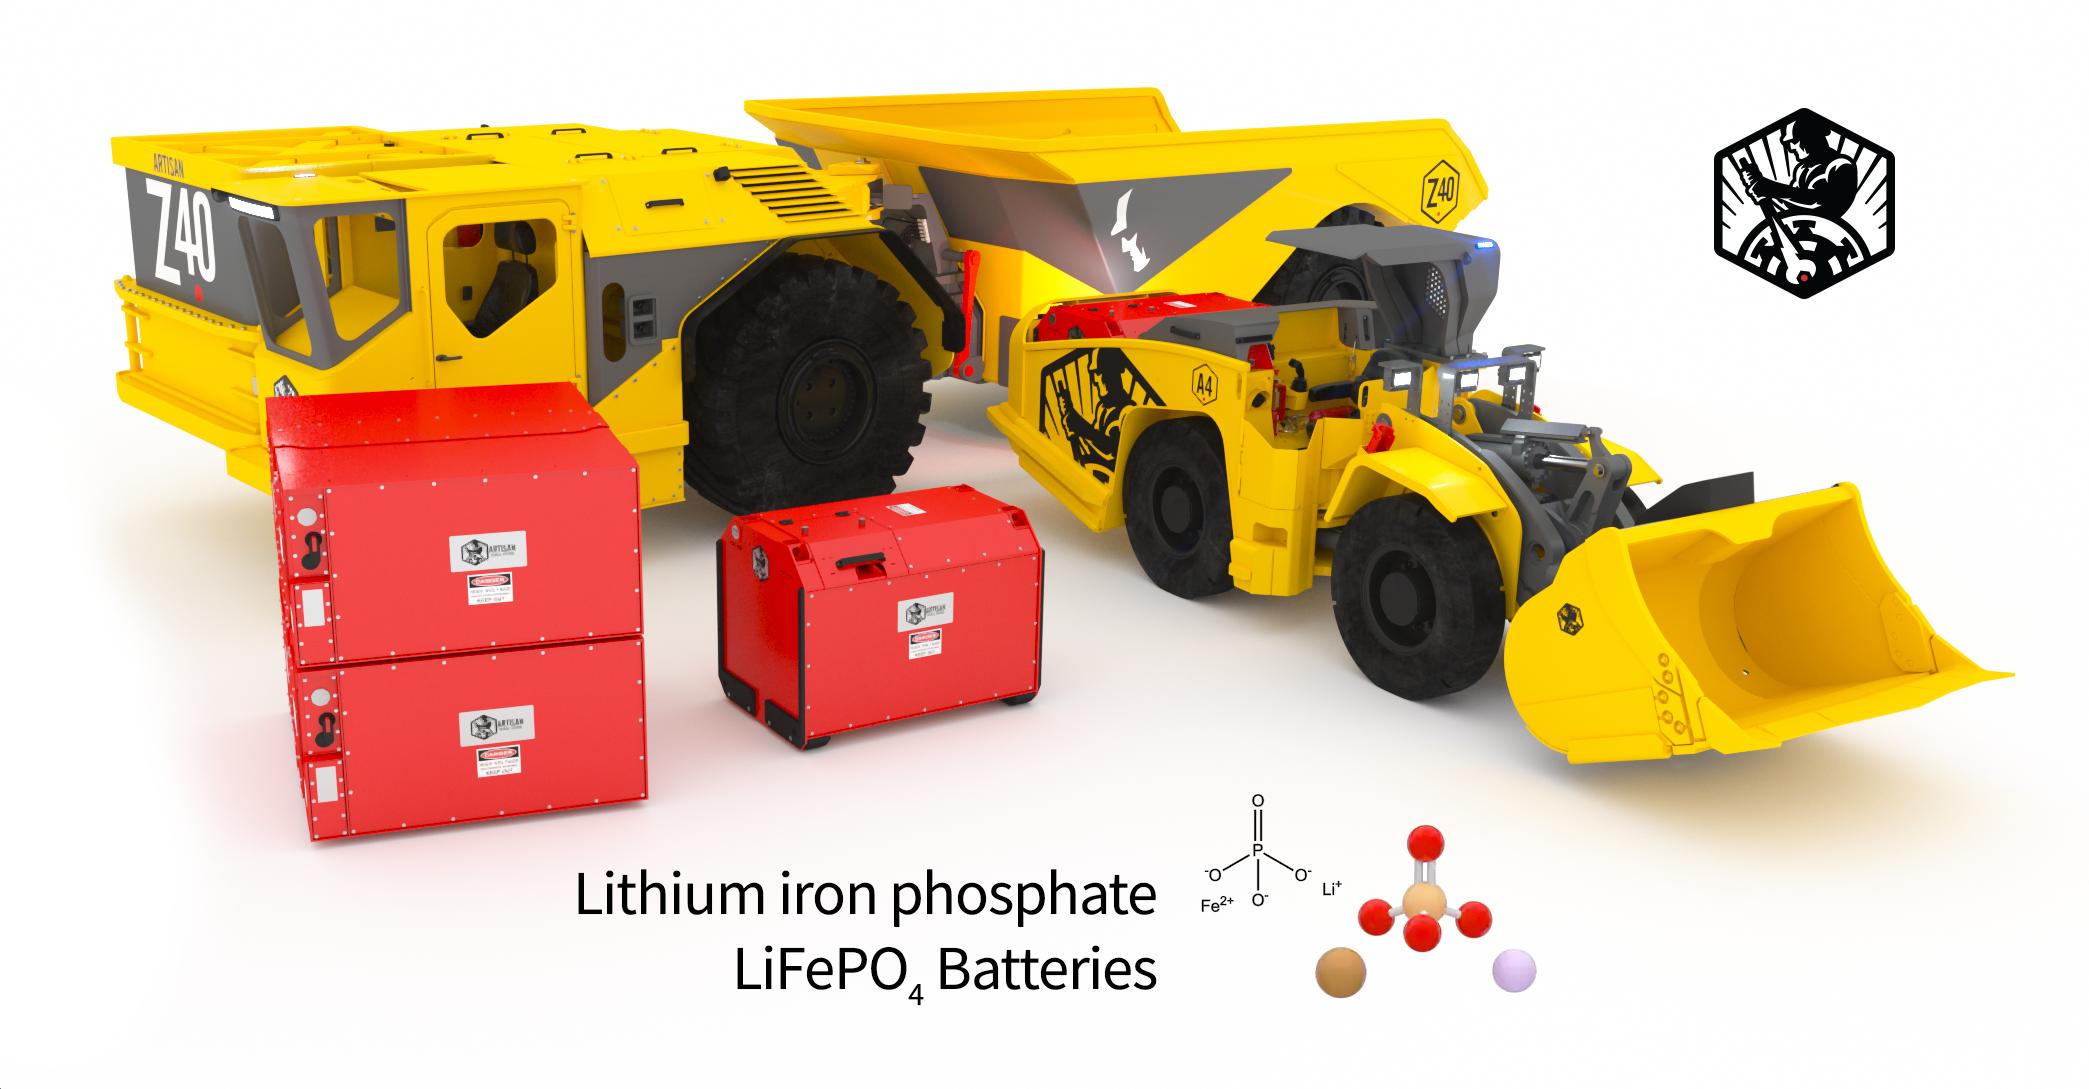 Why We Use Lithium Iron Phosphate